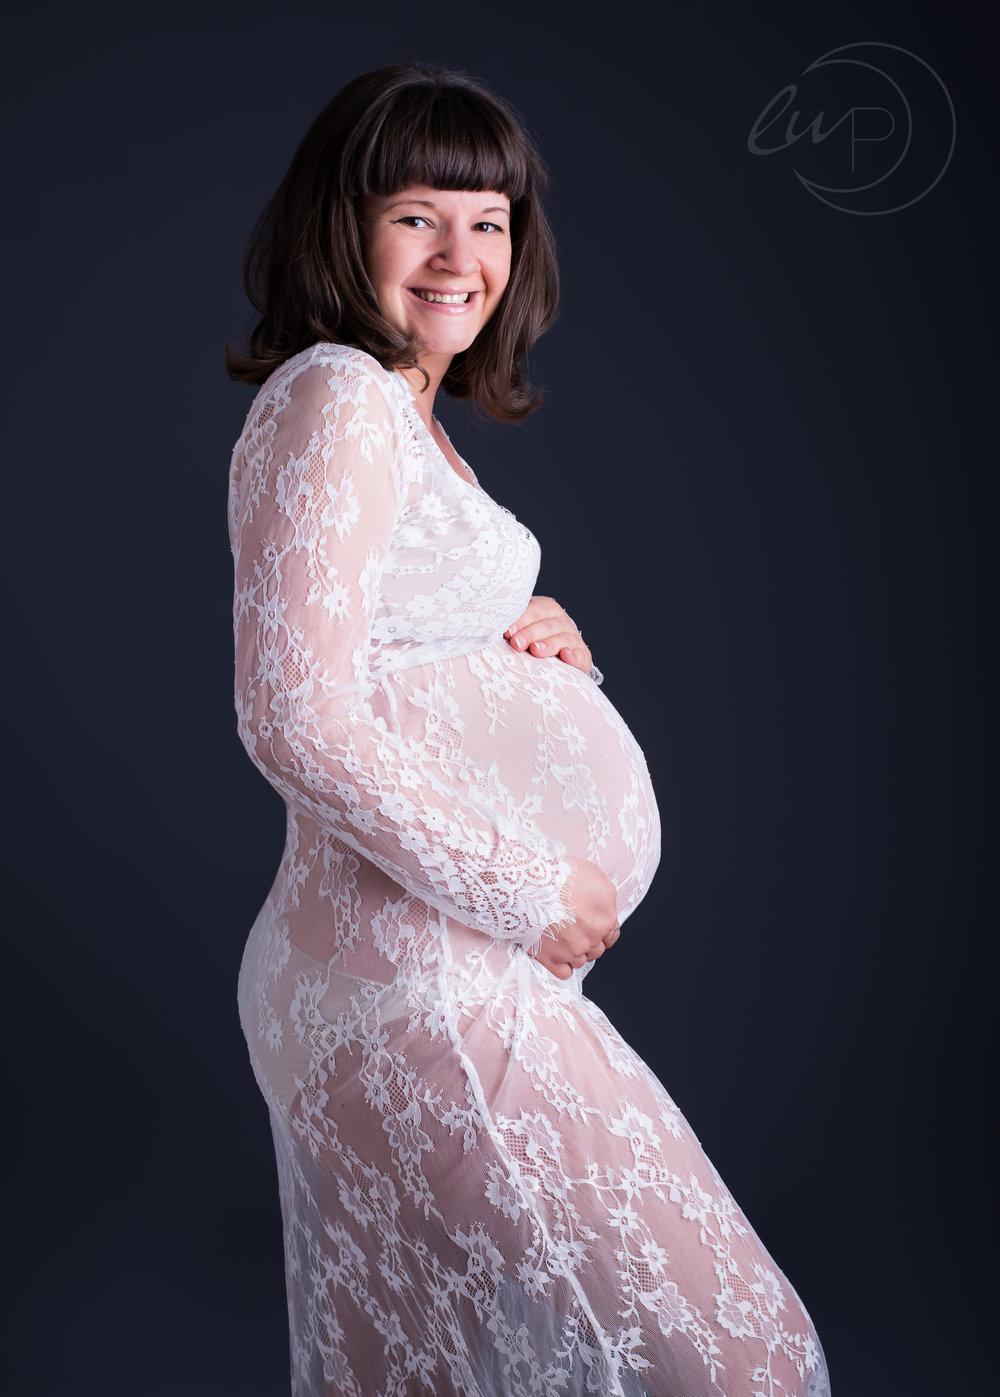 Nicola-maternity-11-Edit-Edit-Edit-Edit.jpg